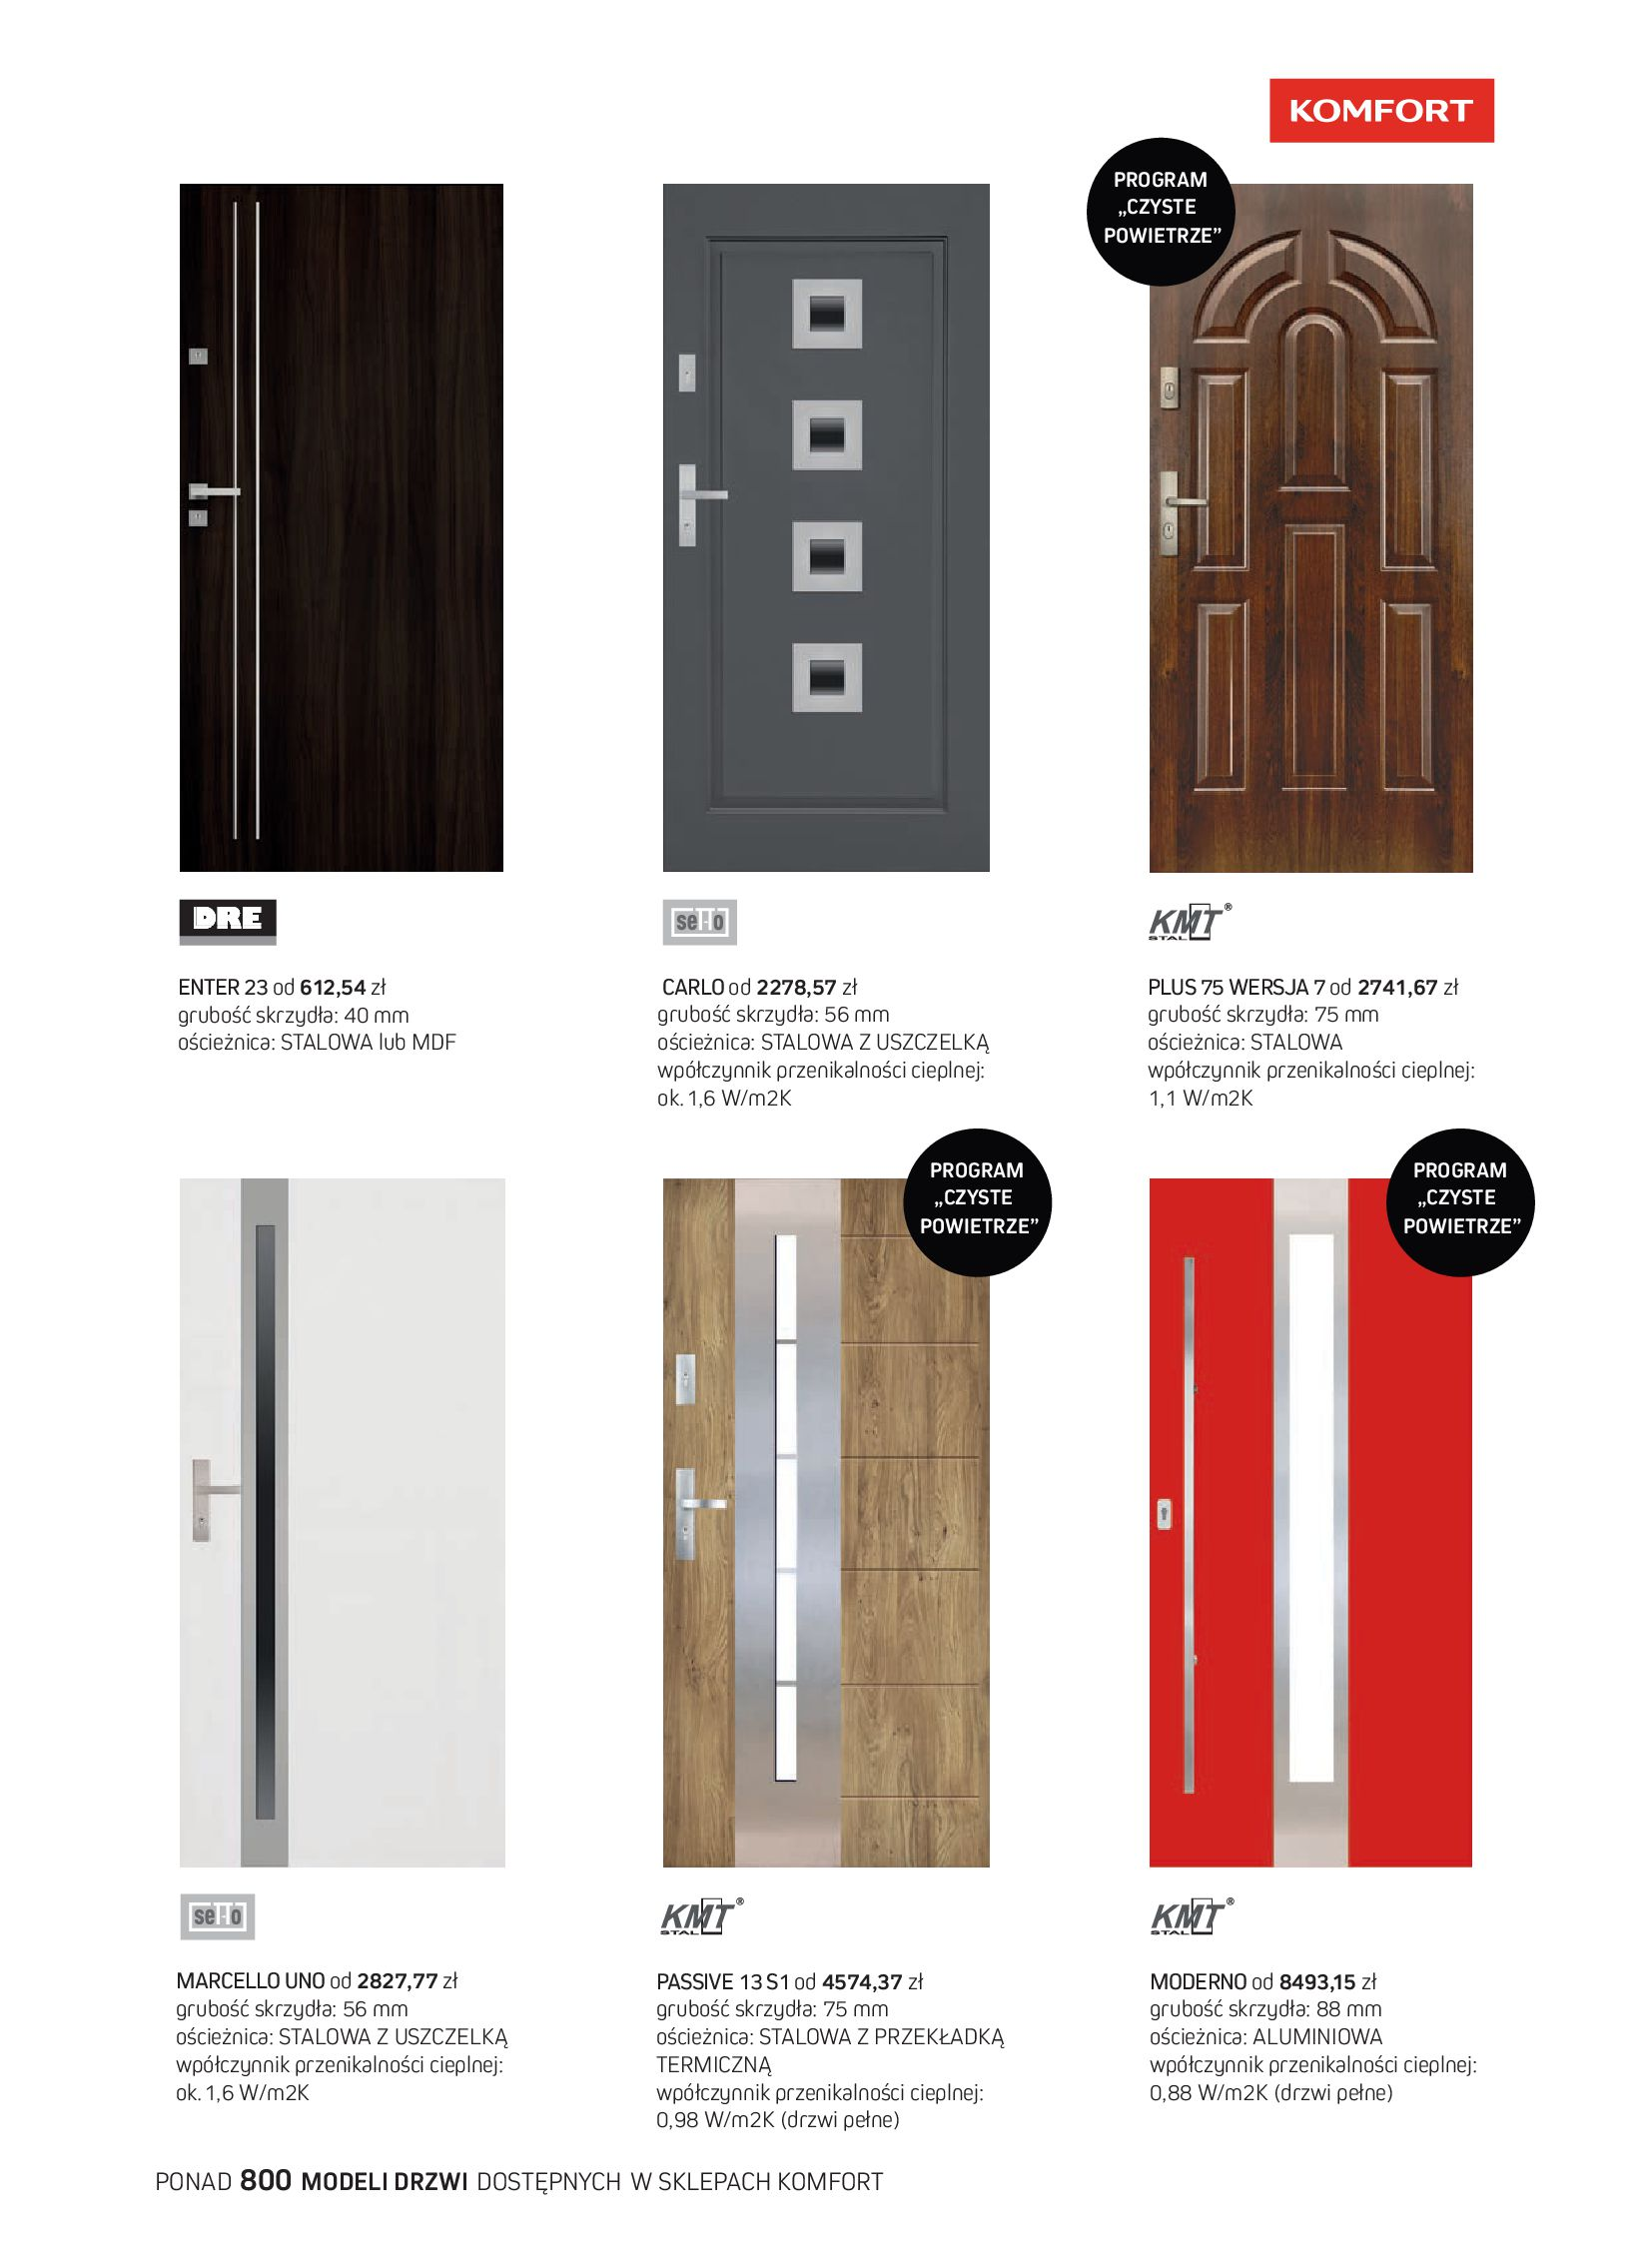 Gazetka Komfort: Gazetka Komfort - Katalog podłogi i drzwi 2021-06-16 page-61